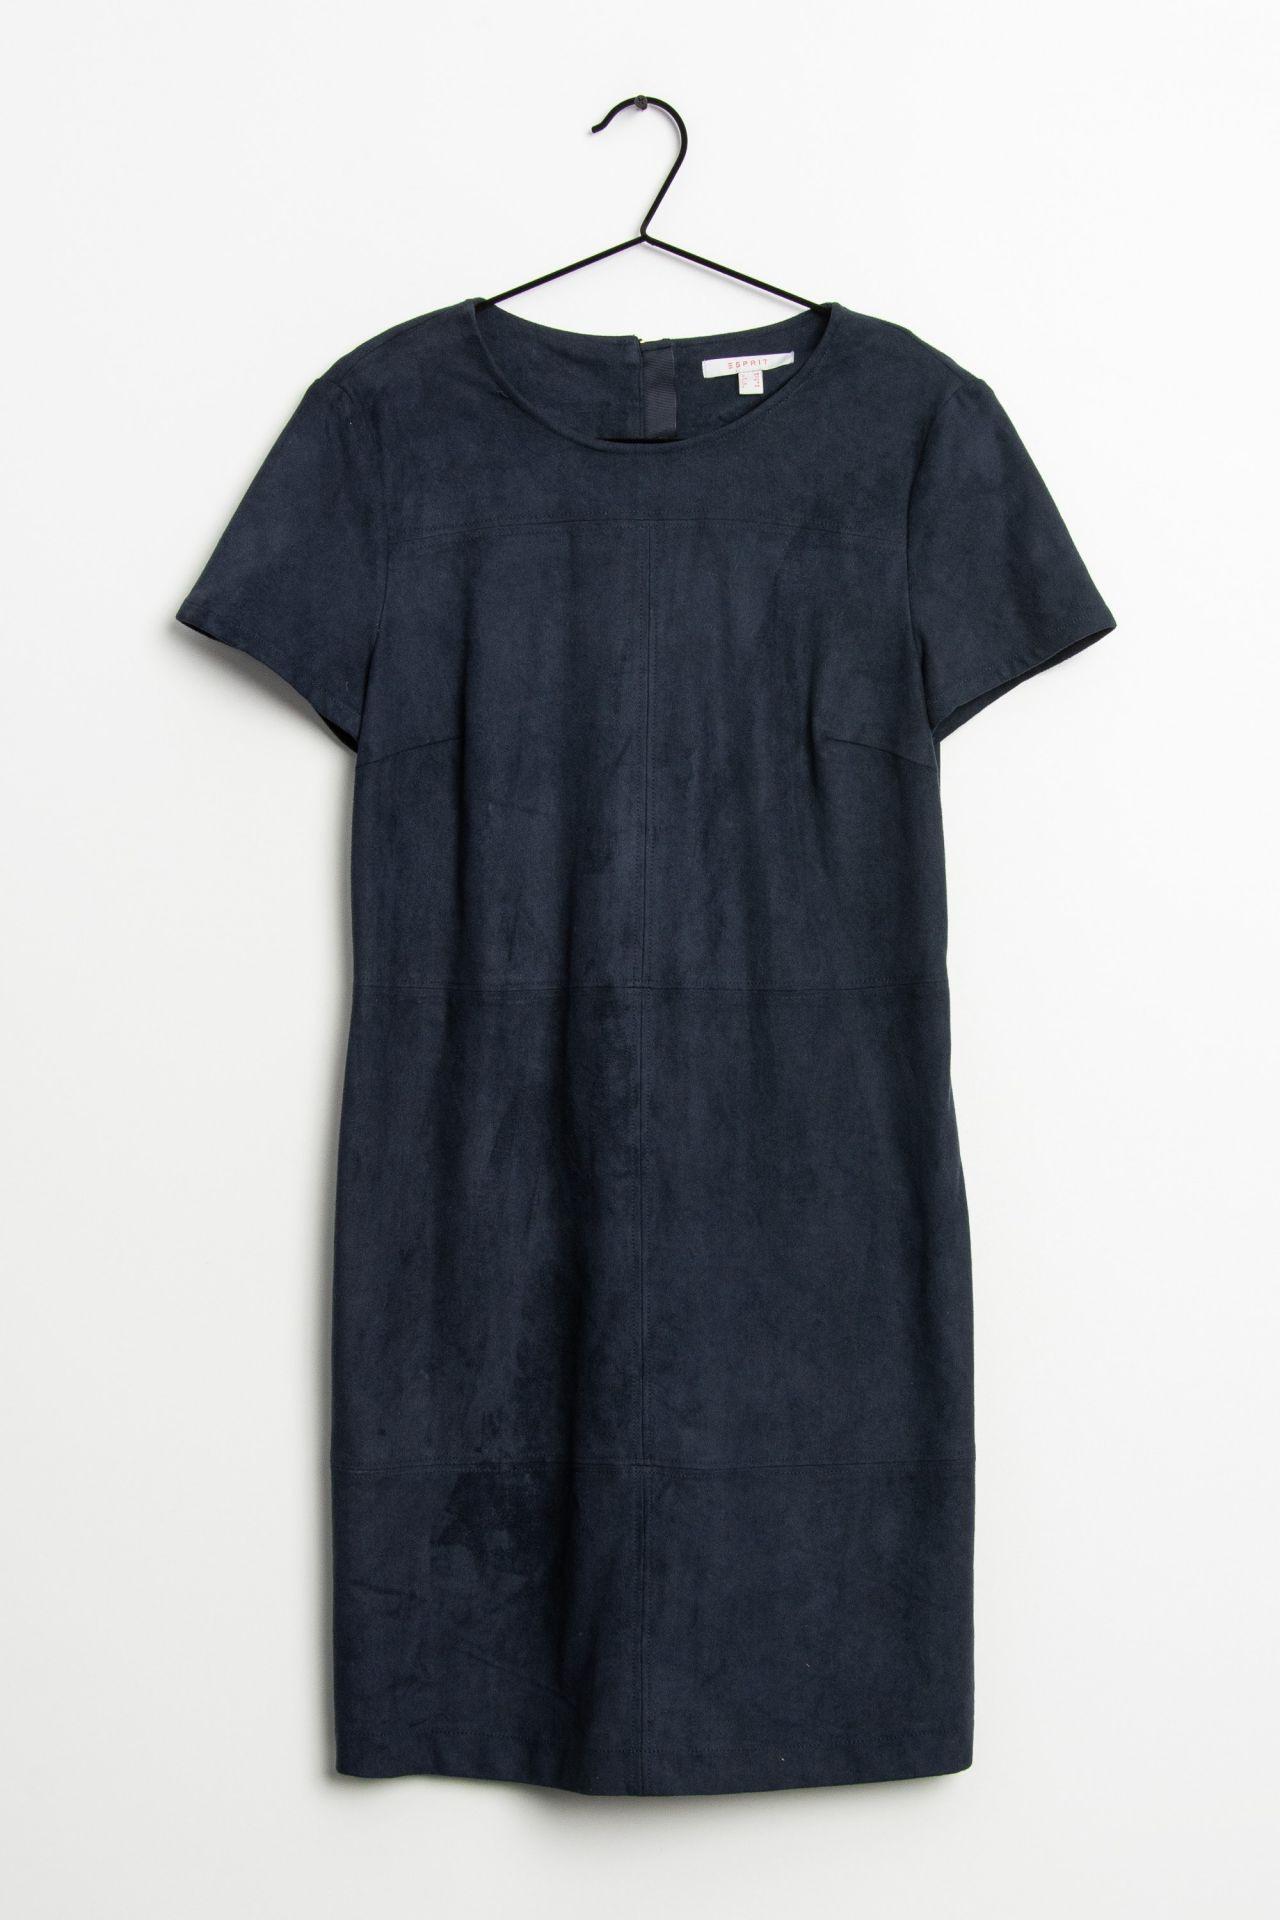 Esprit Kleid Blau Gr38  10067785